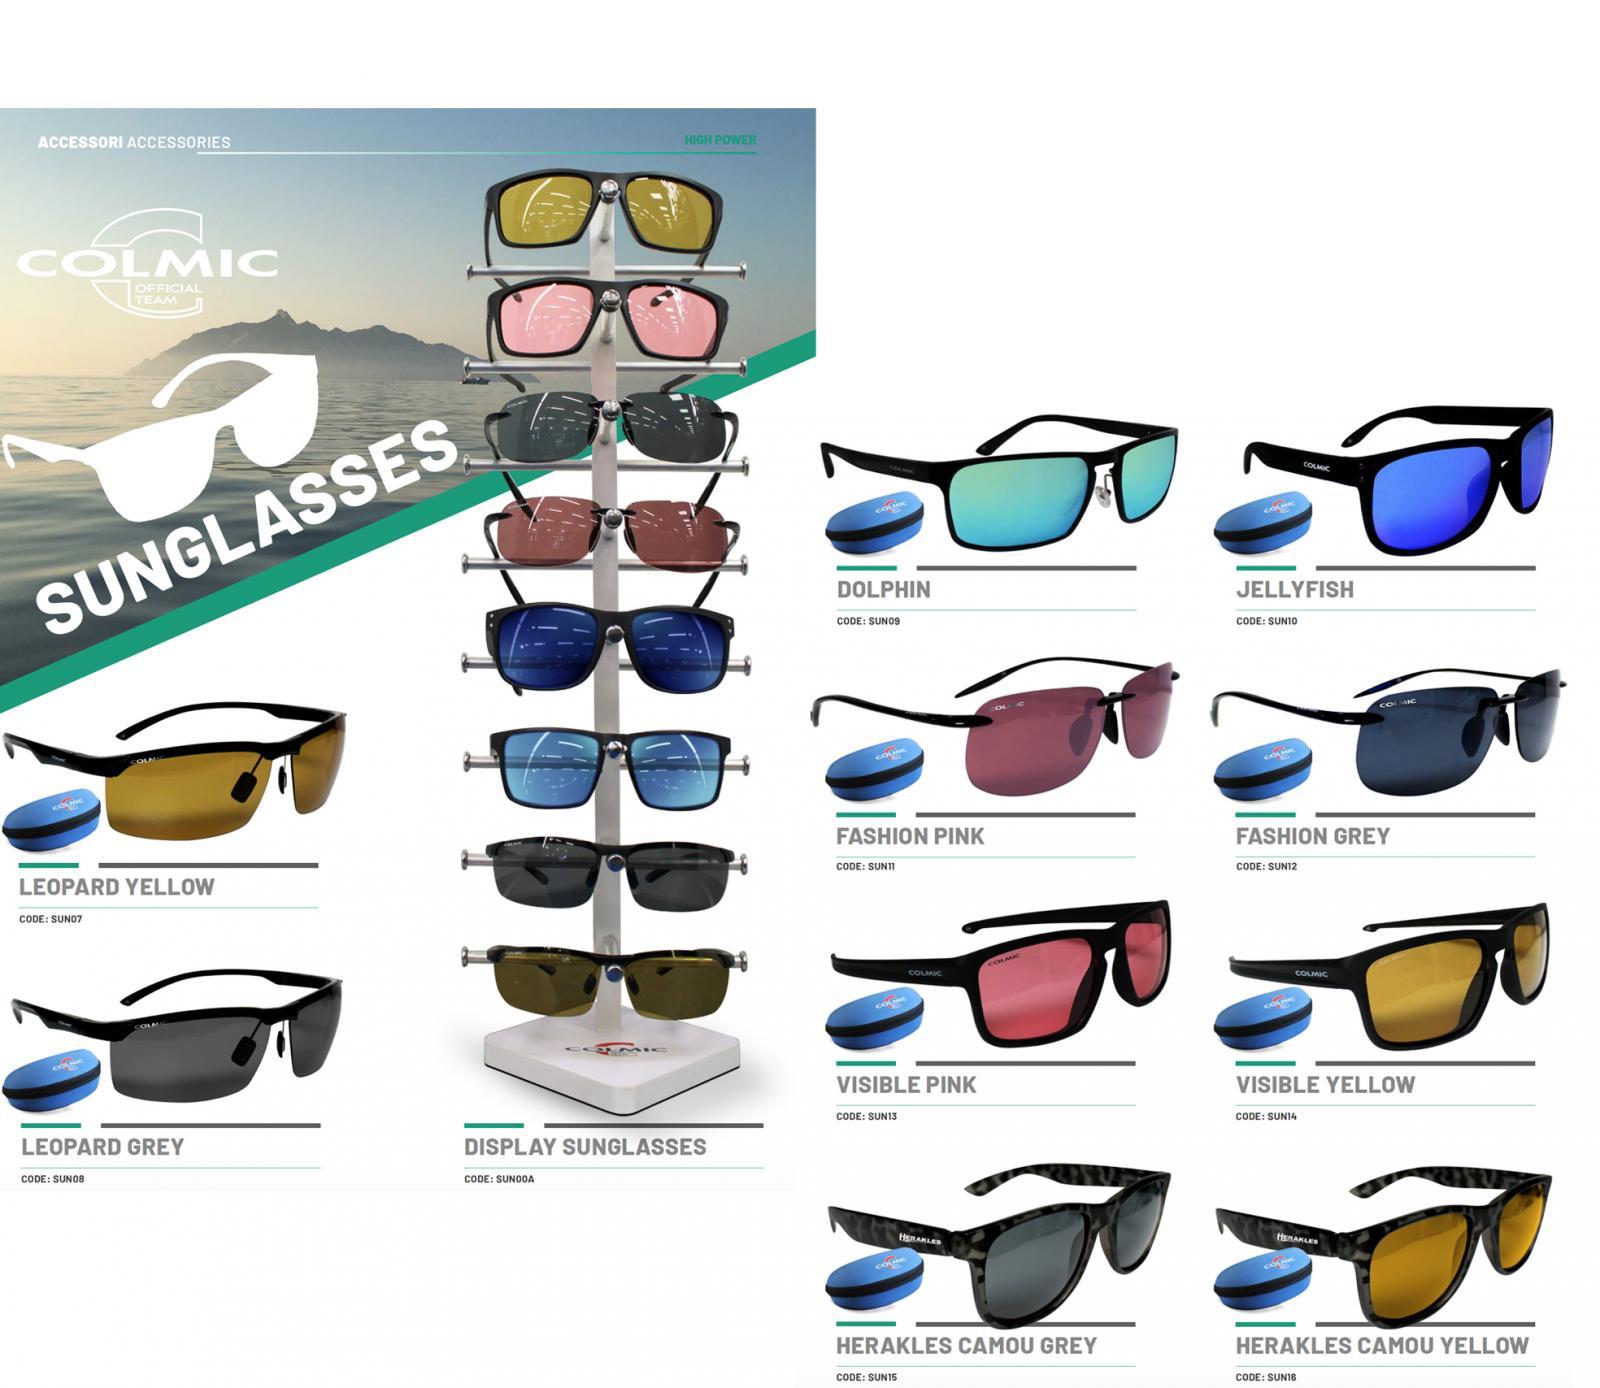 occhiali colmic